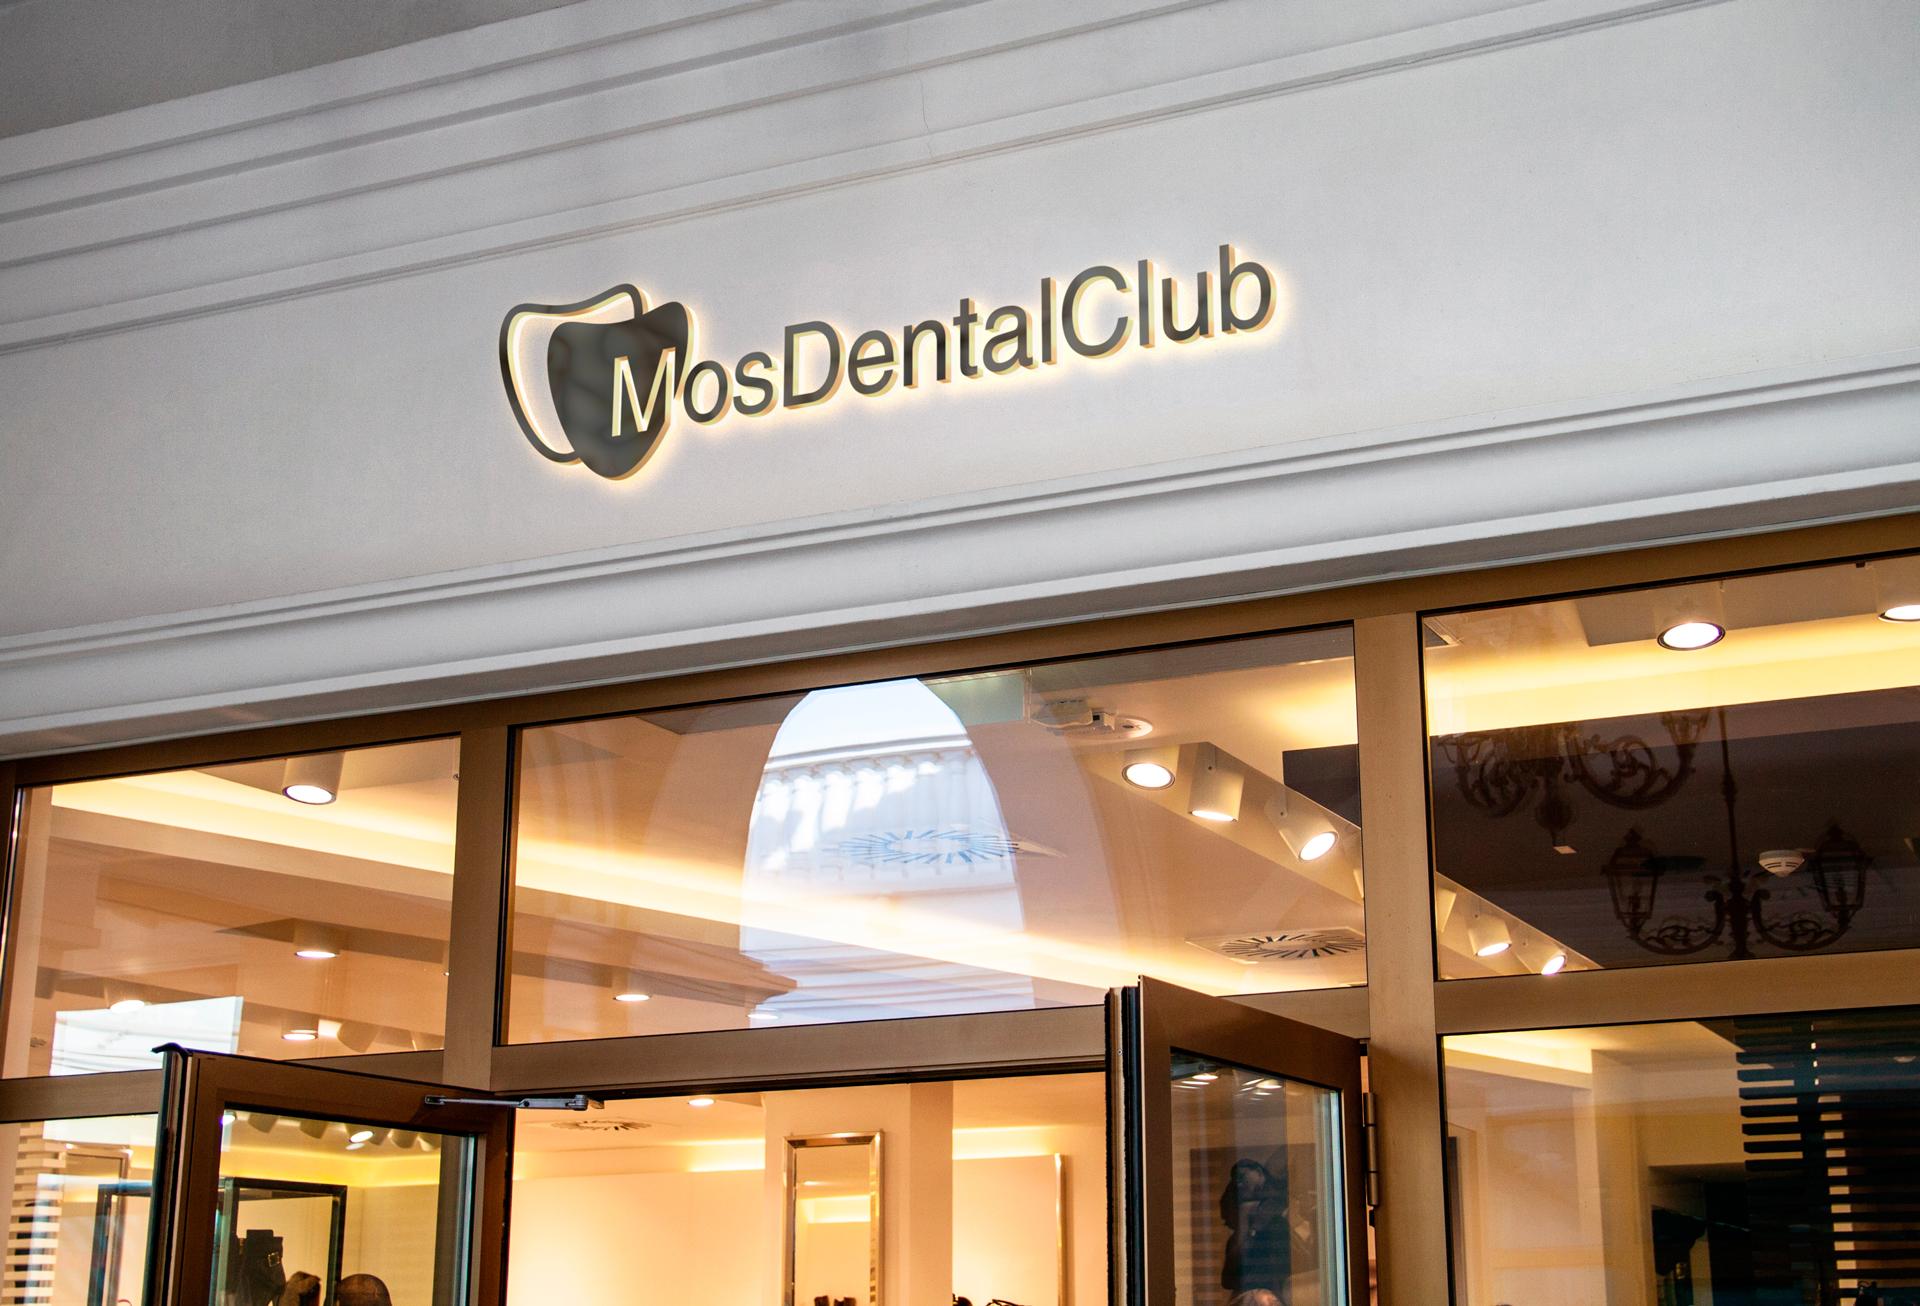 Разработка логотипа стоматологического медицинского центра фото f_9225e49933e38d14.jpg